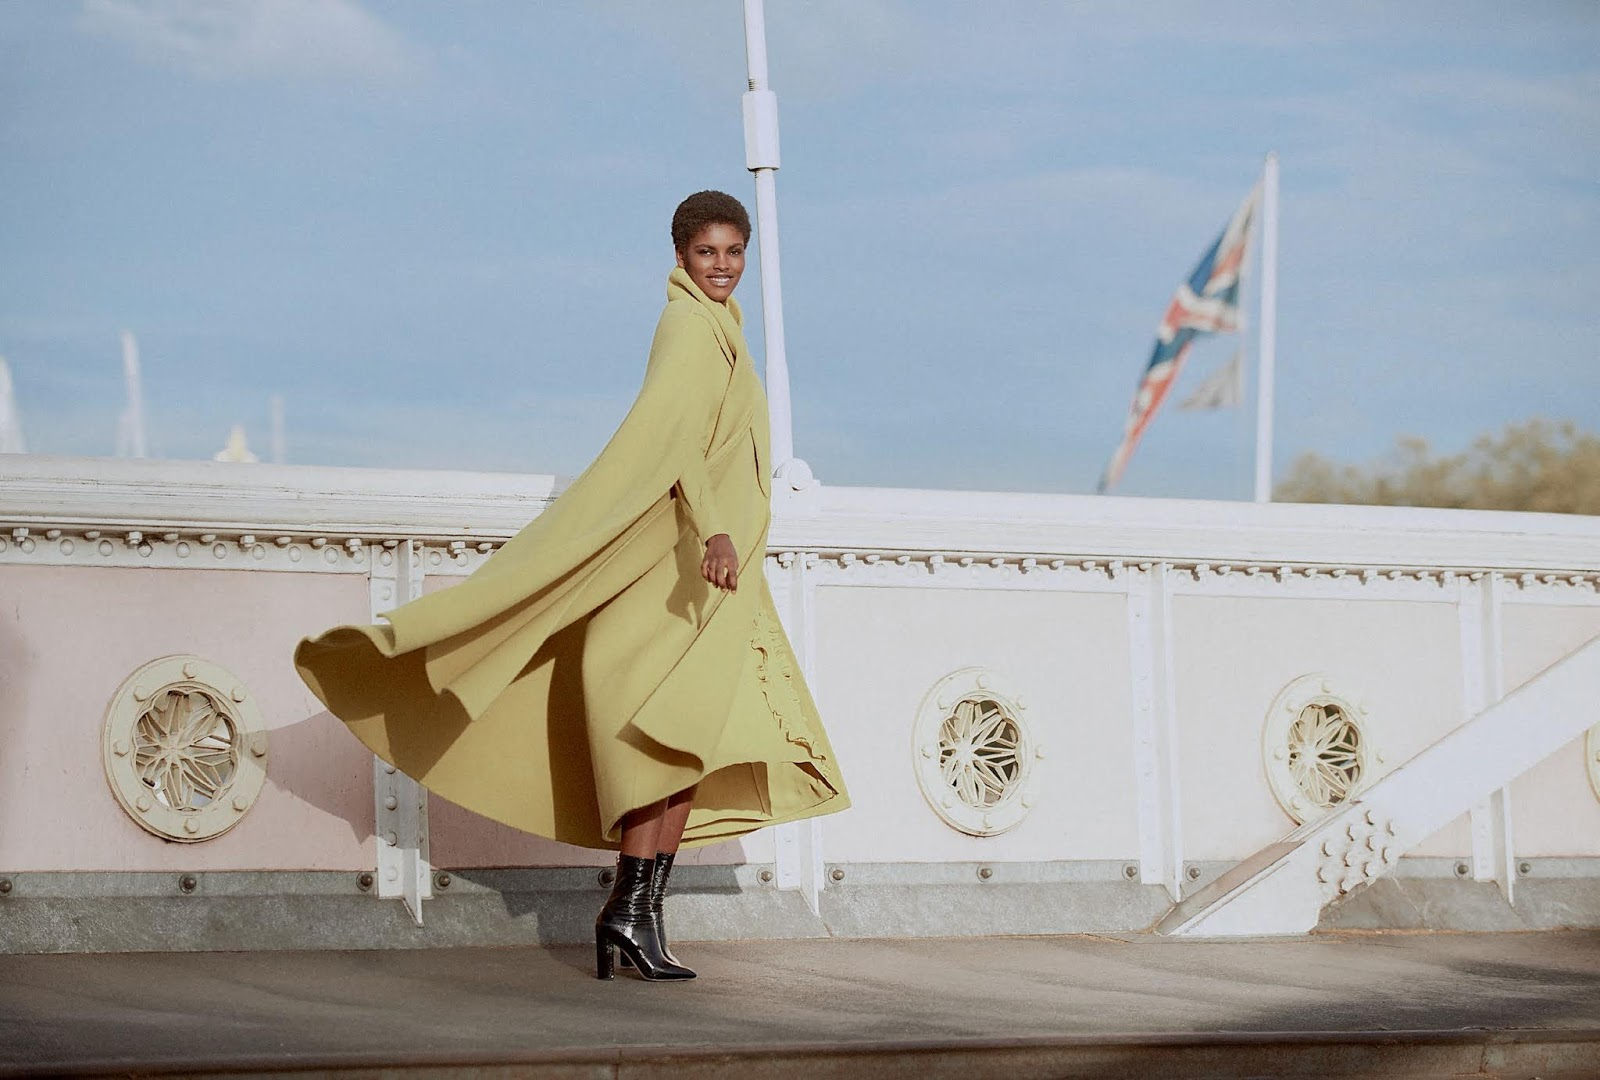 Amilna Estevao by Regan Cameron for Harper's Bazaar UK Sept 2019 (9).jpg